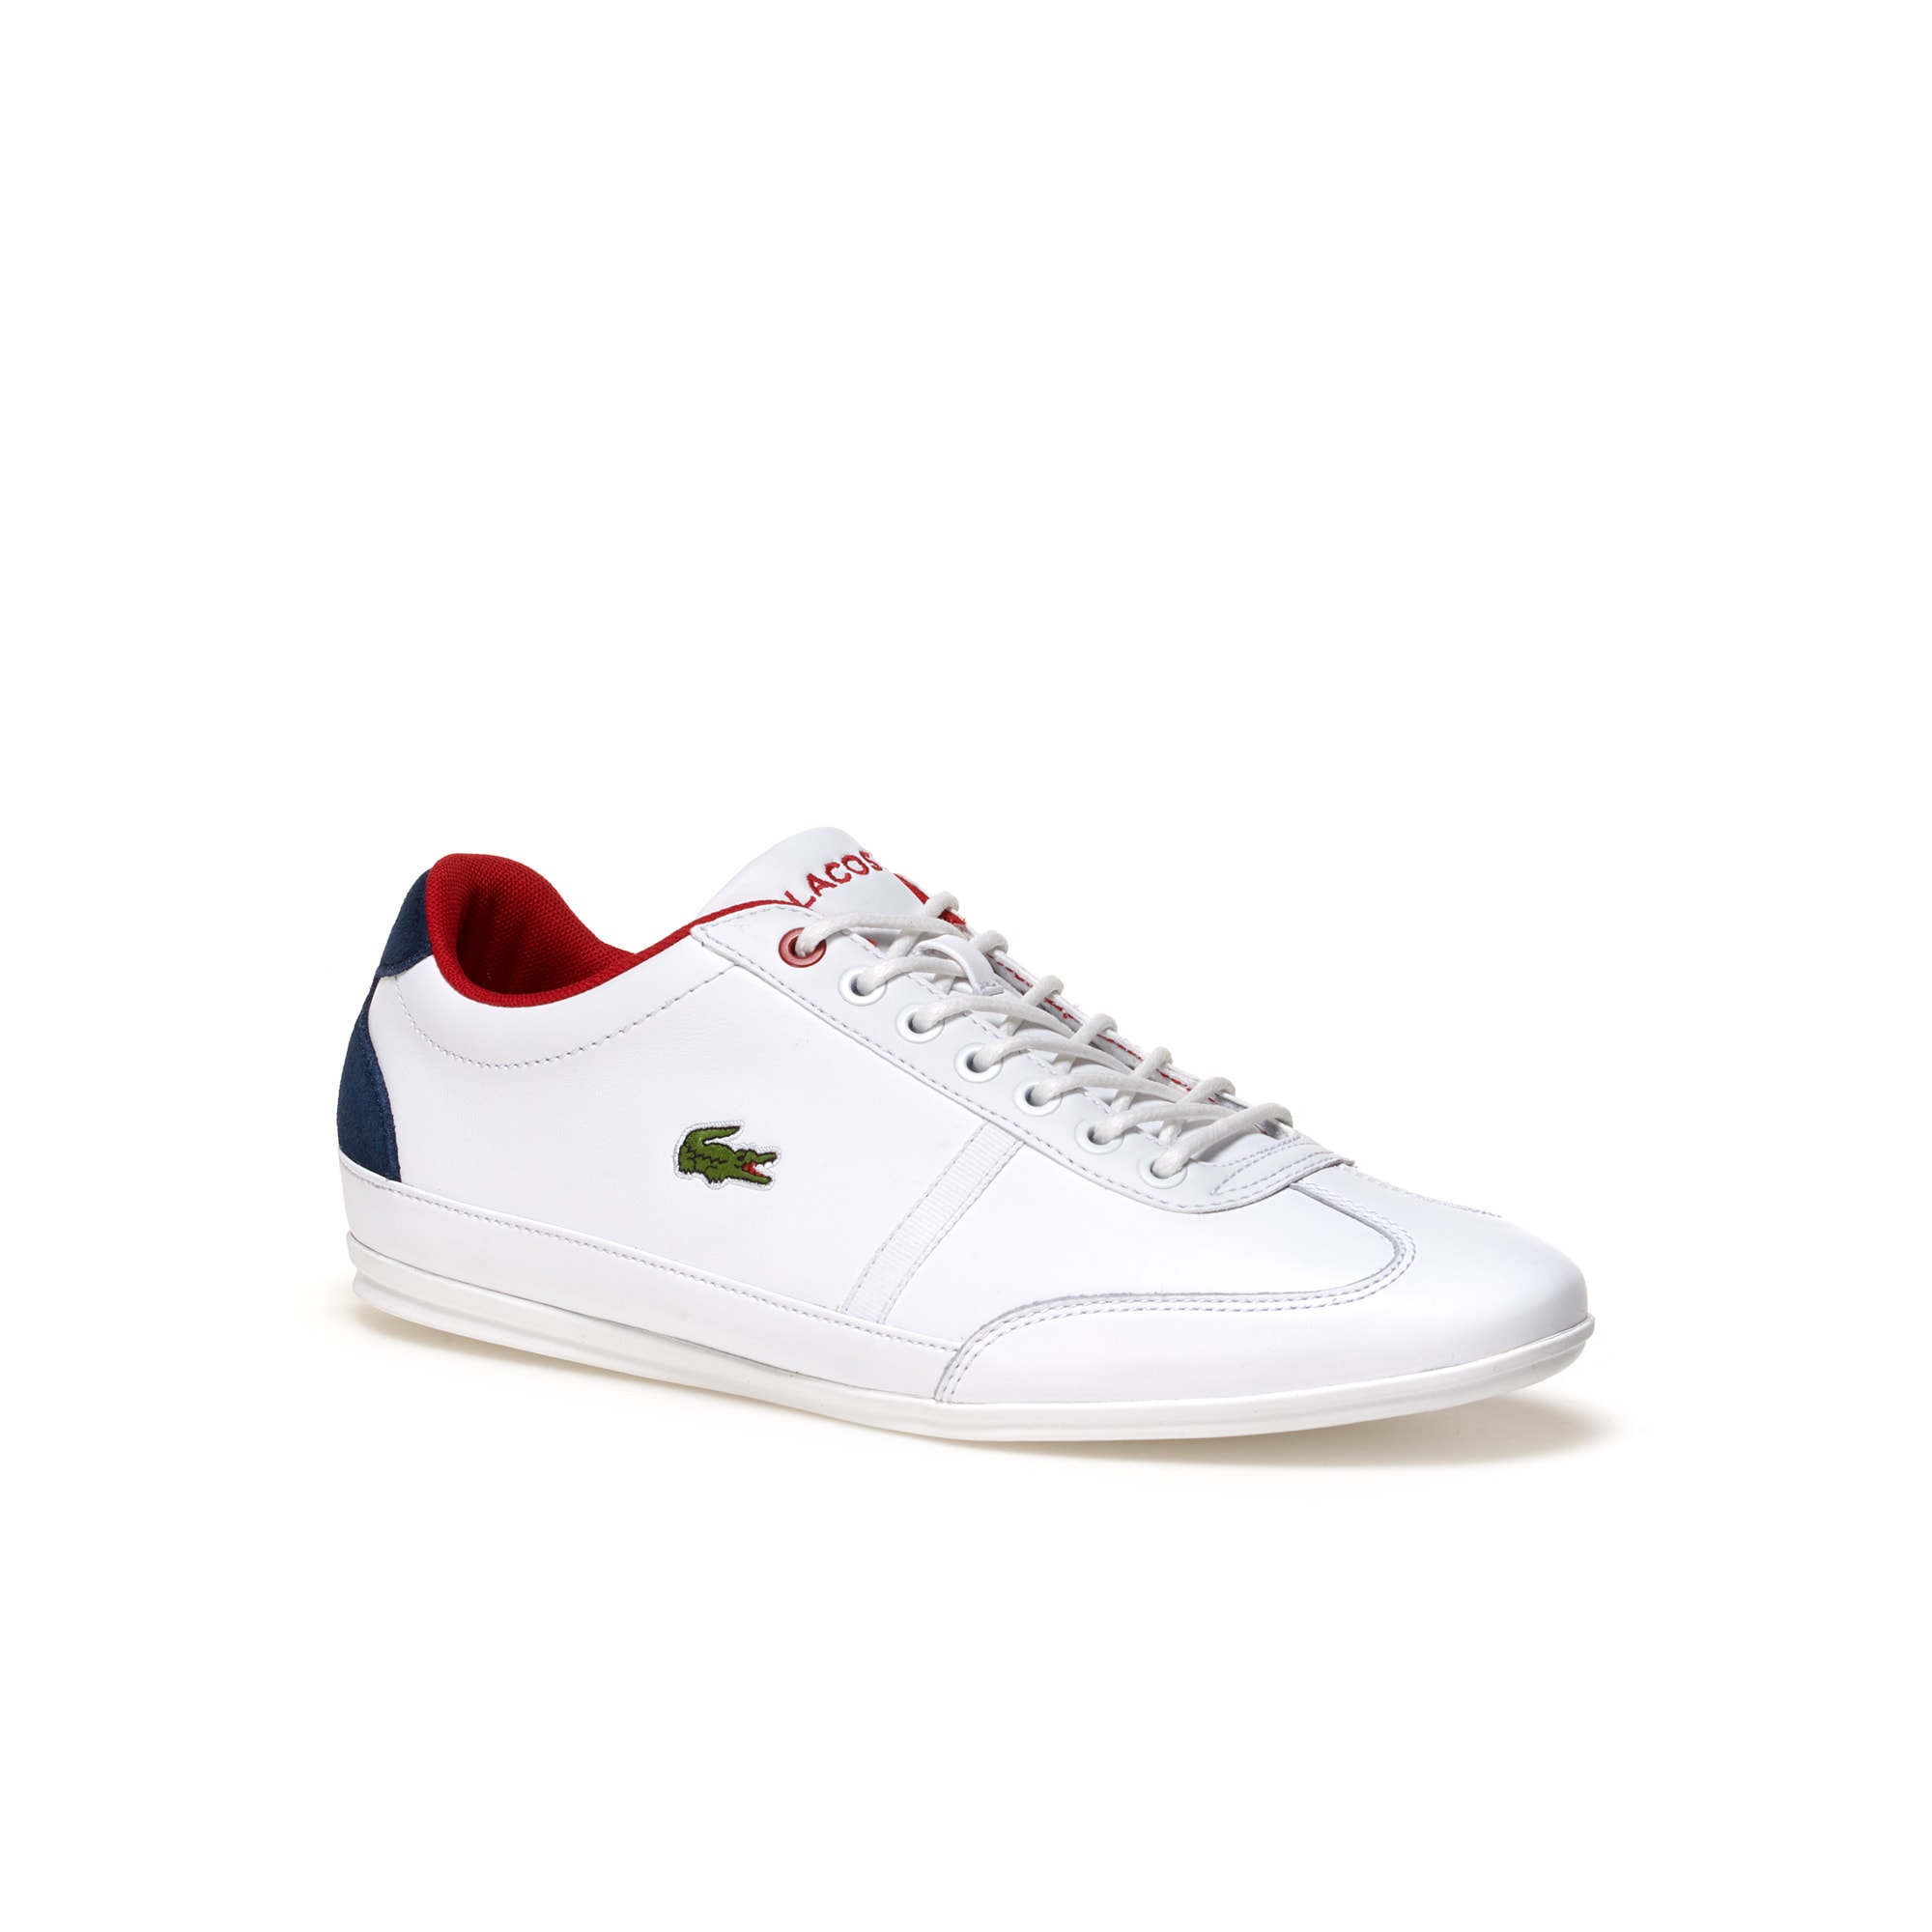 Herren-Sneakers MISANO SPORT aus Leder